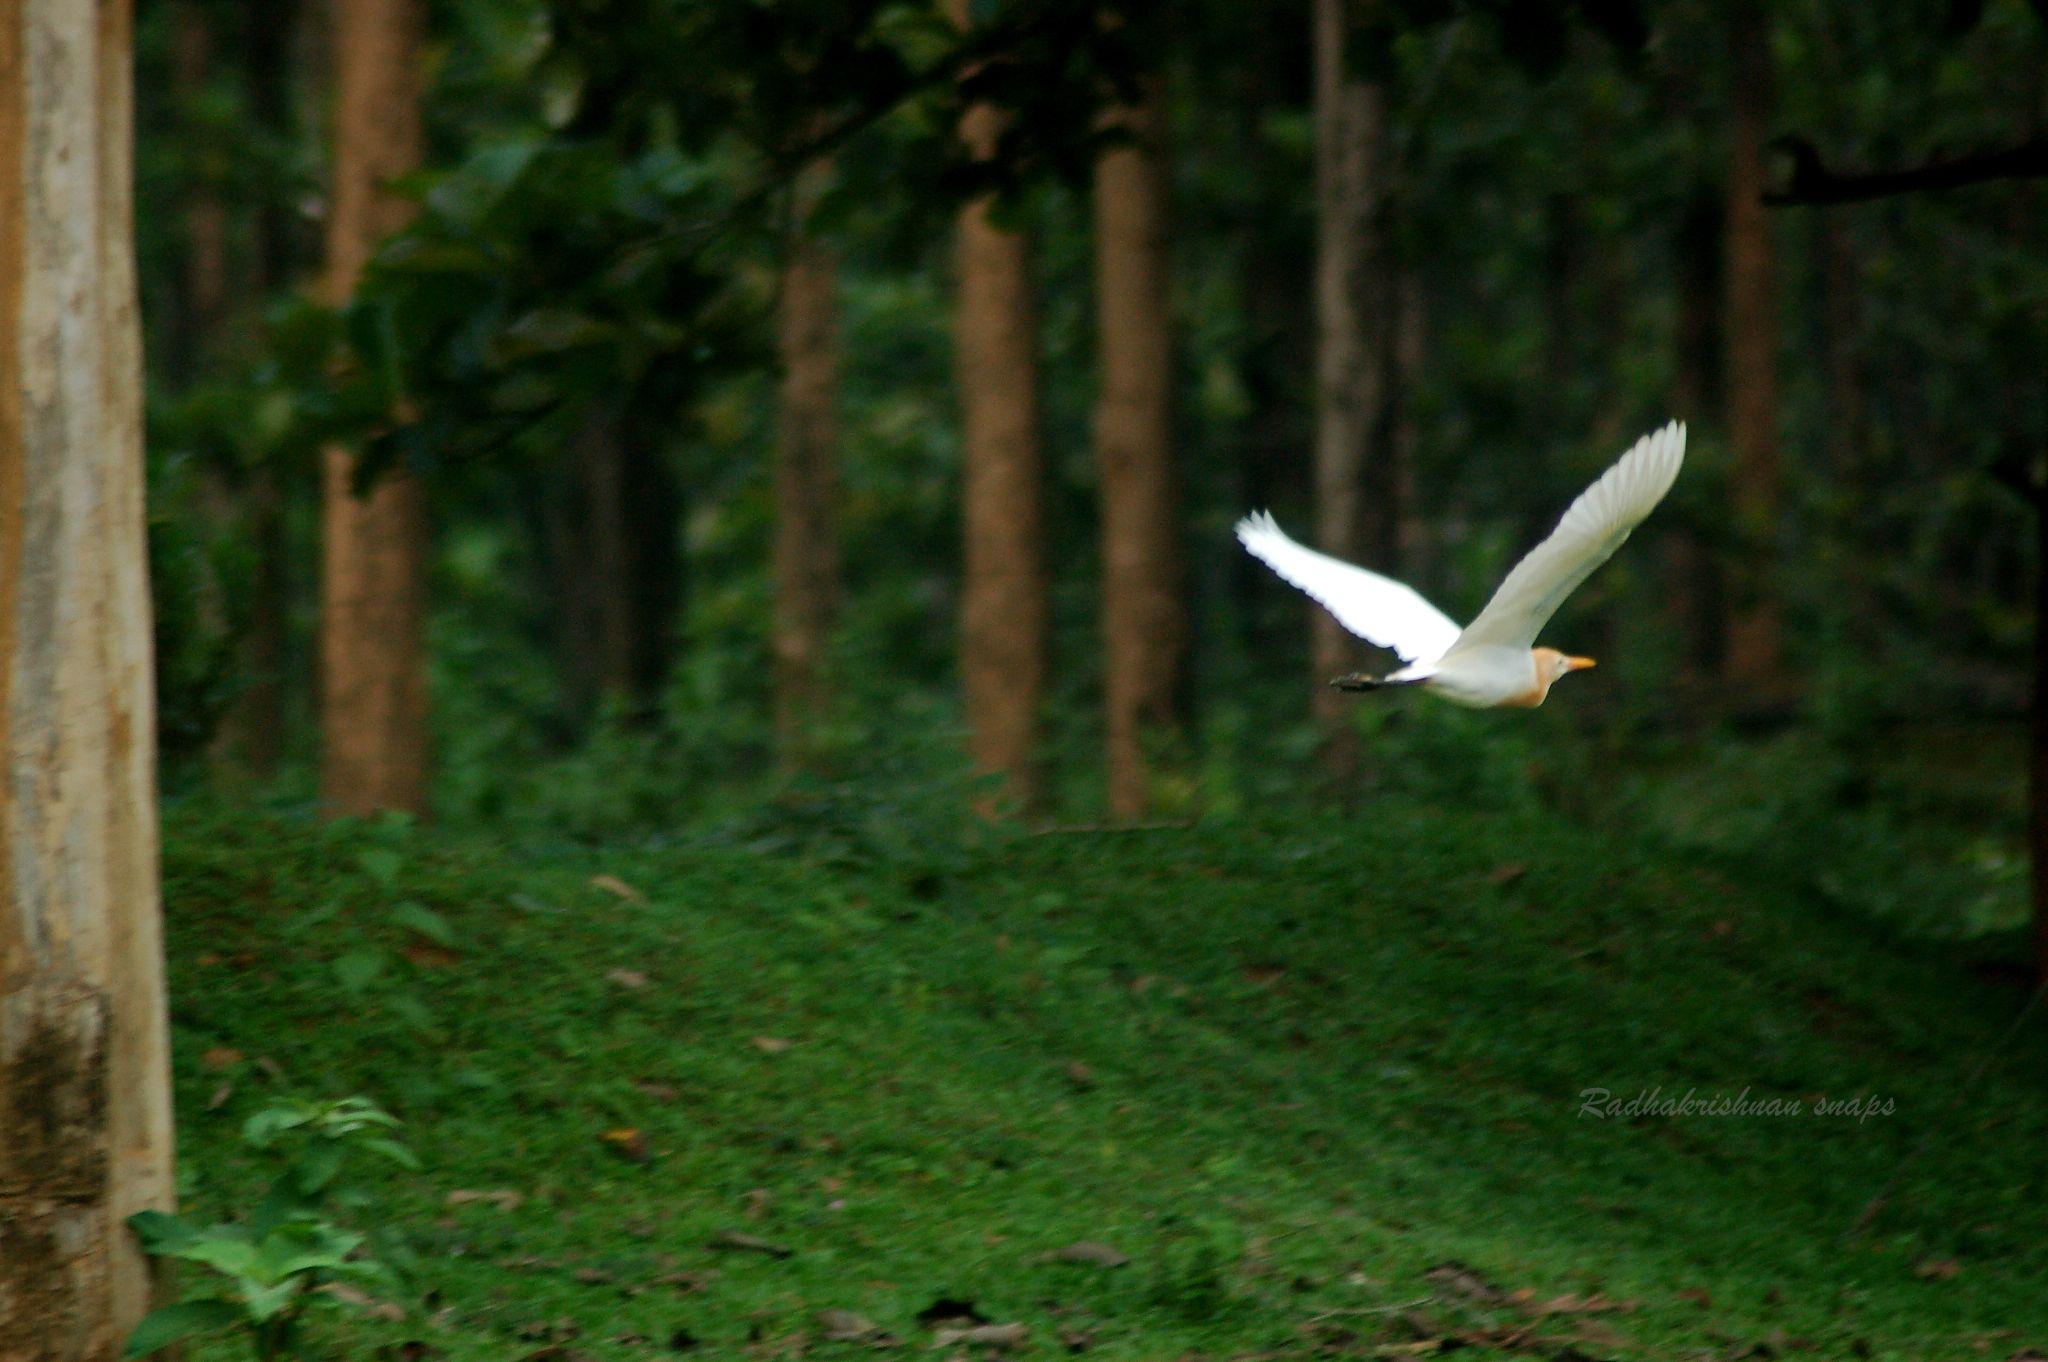 Fly by Radhakrishnan. AG